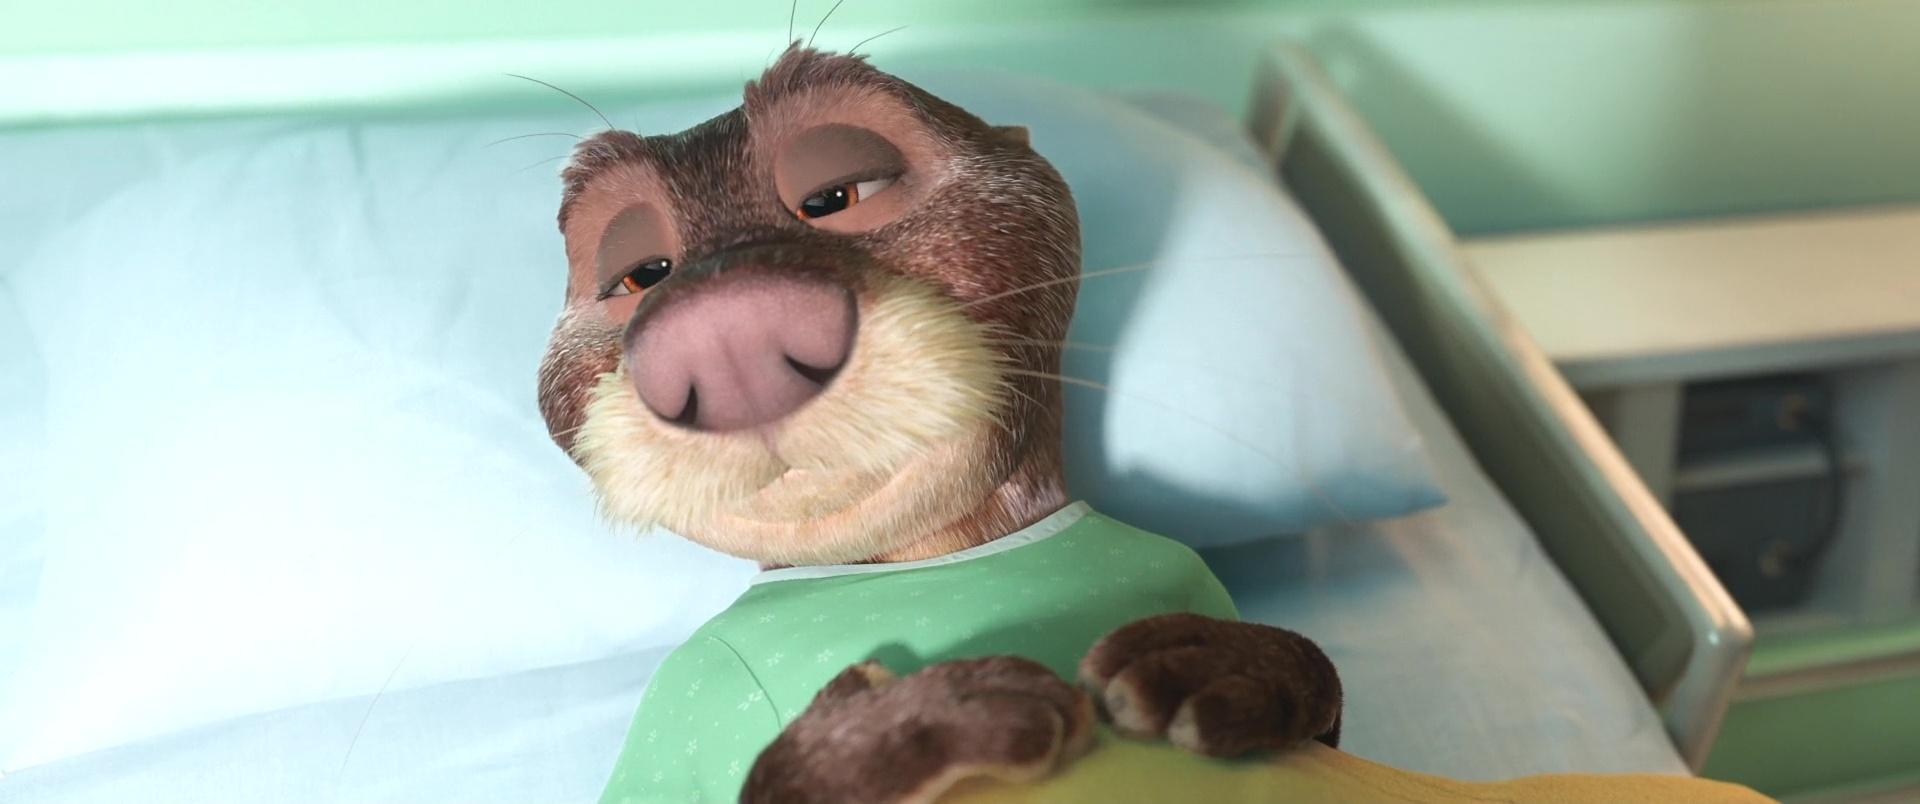 emmett otterton disney personnage character zootopie zootopia